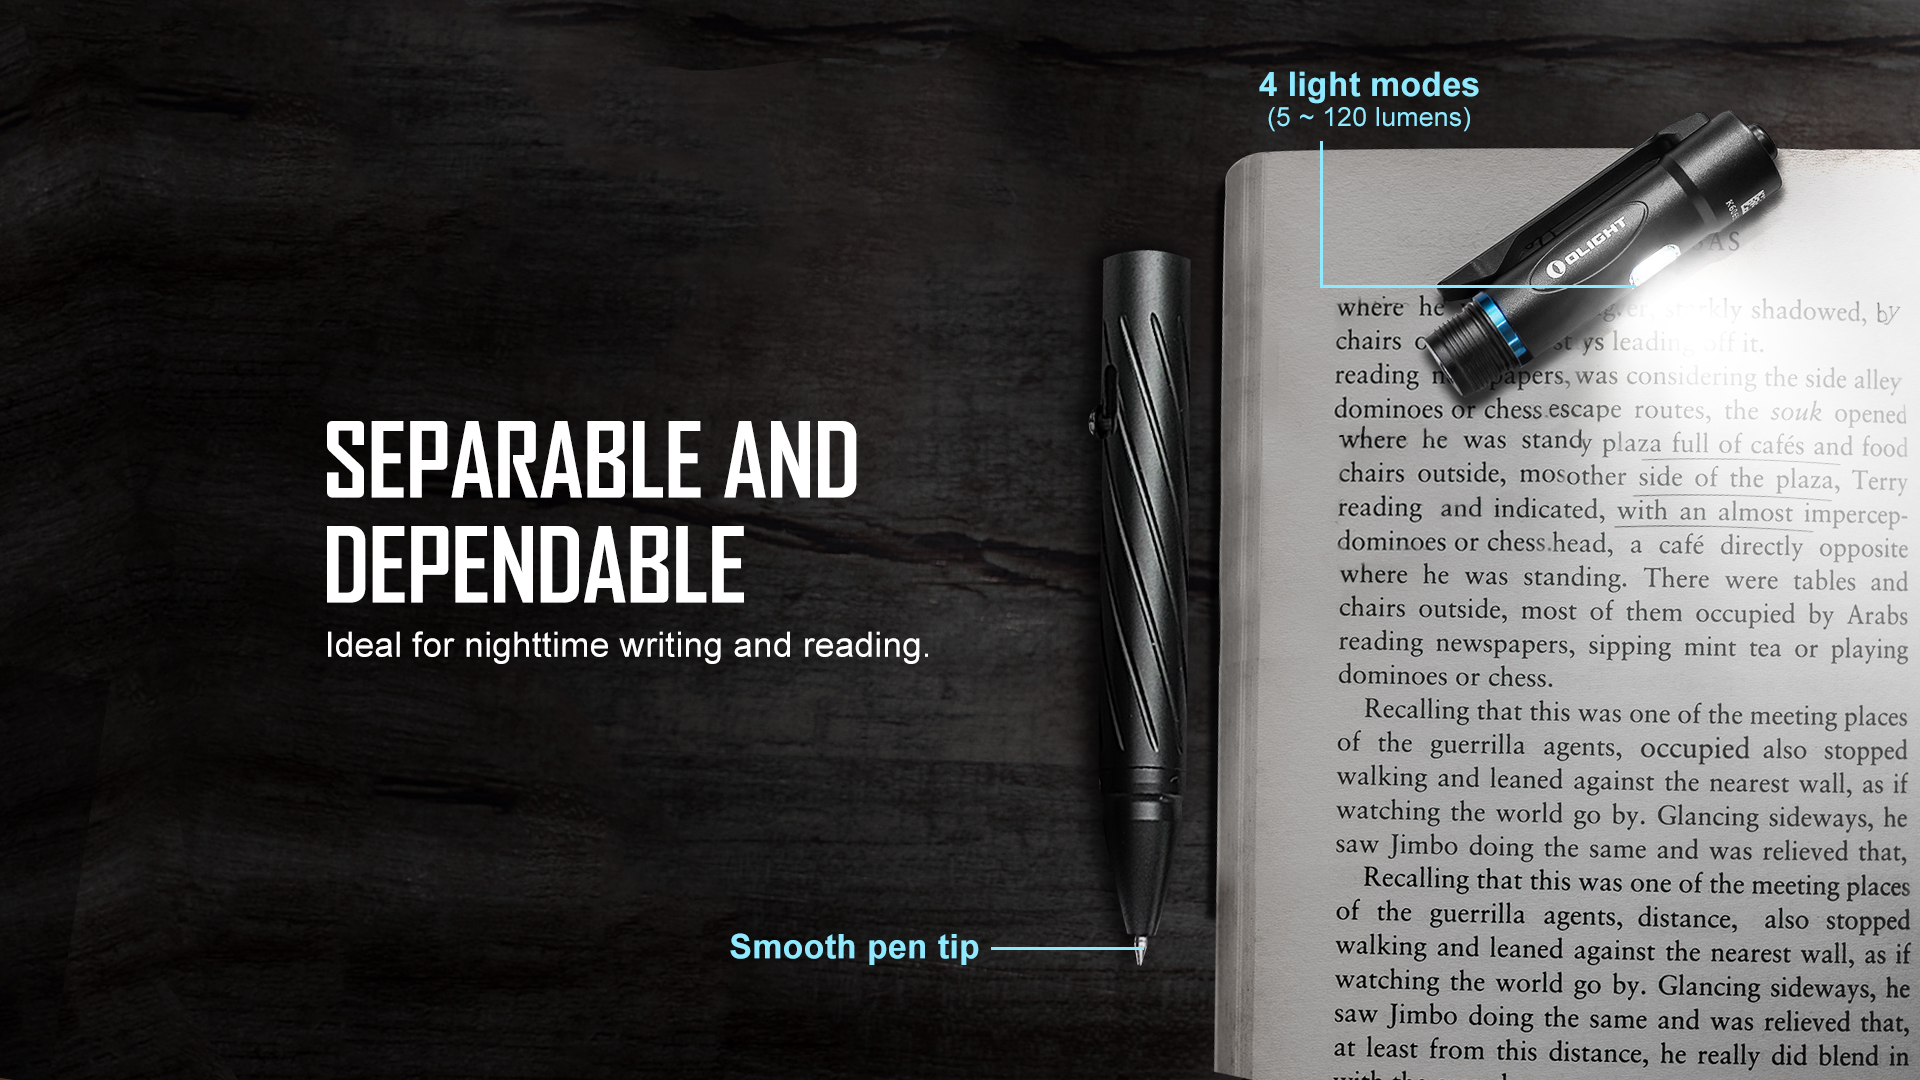 open 2 rechargeable pen light